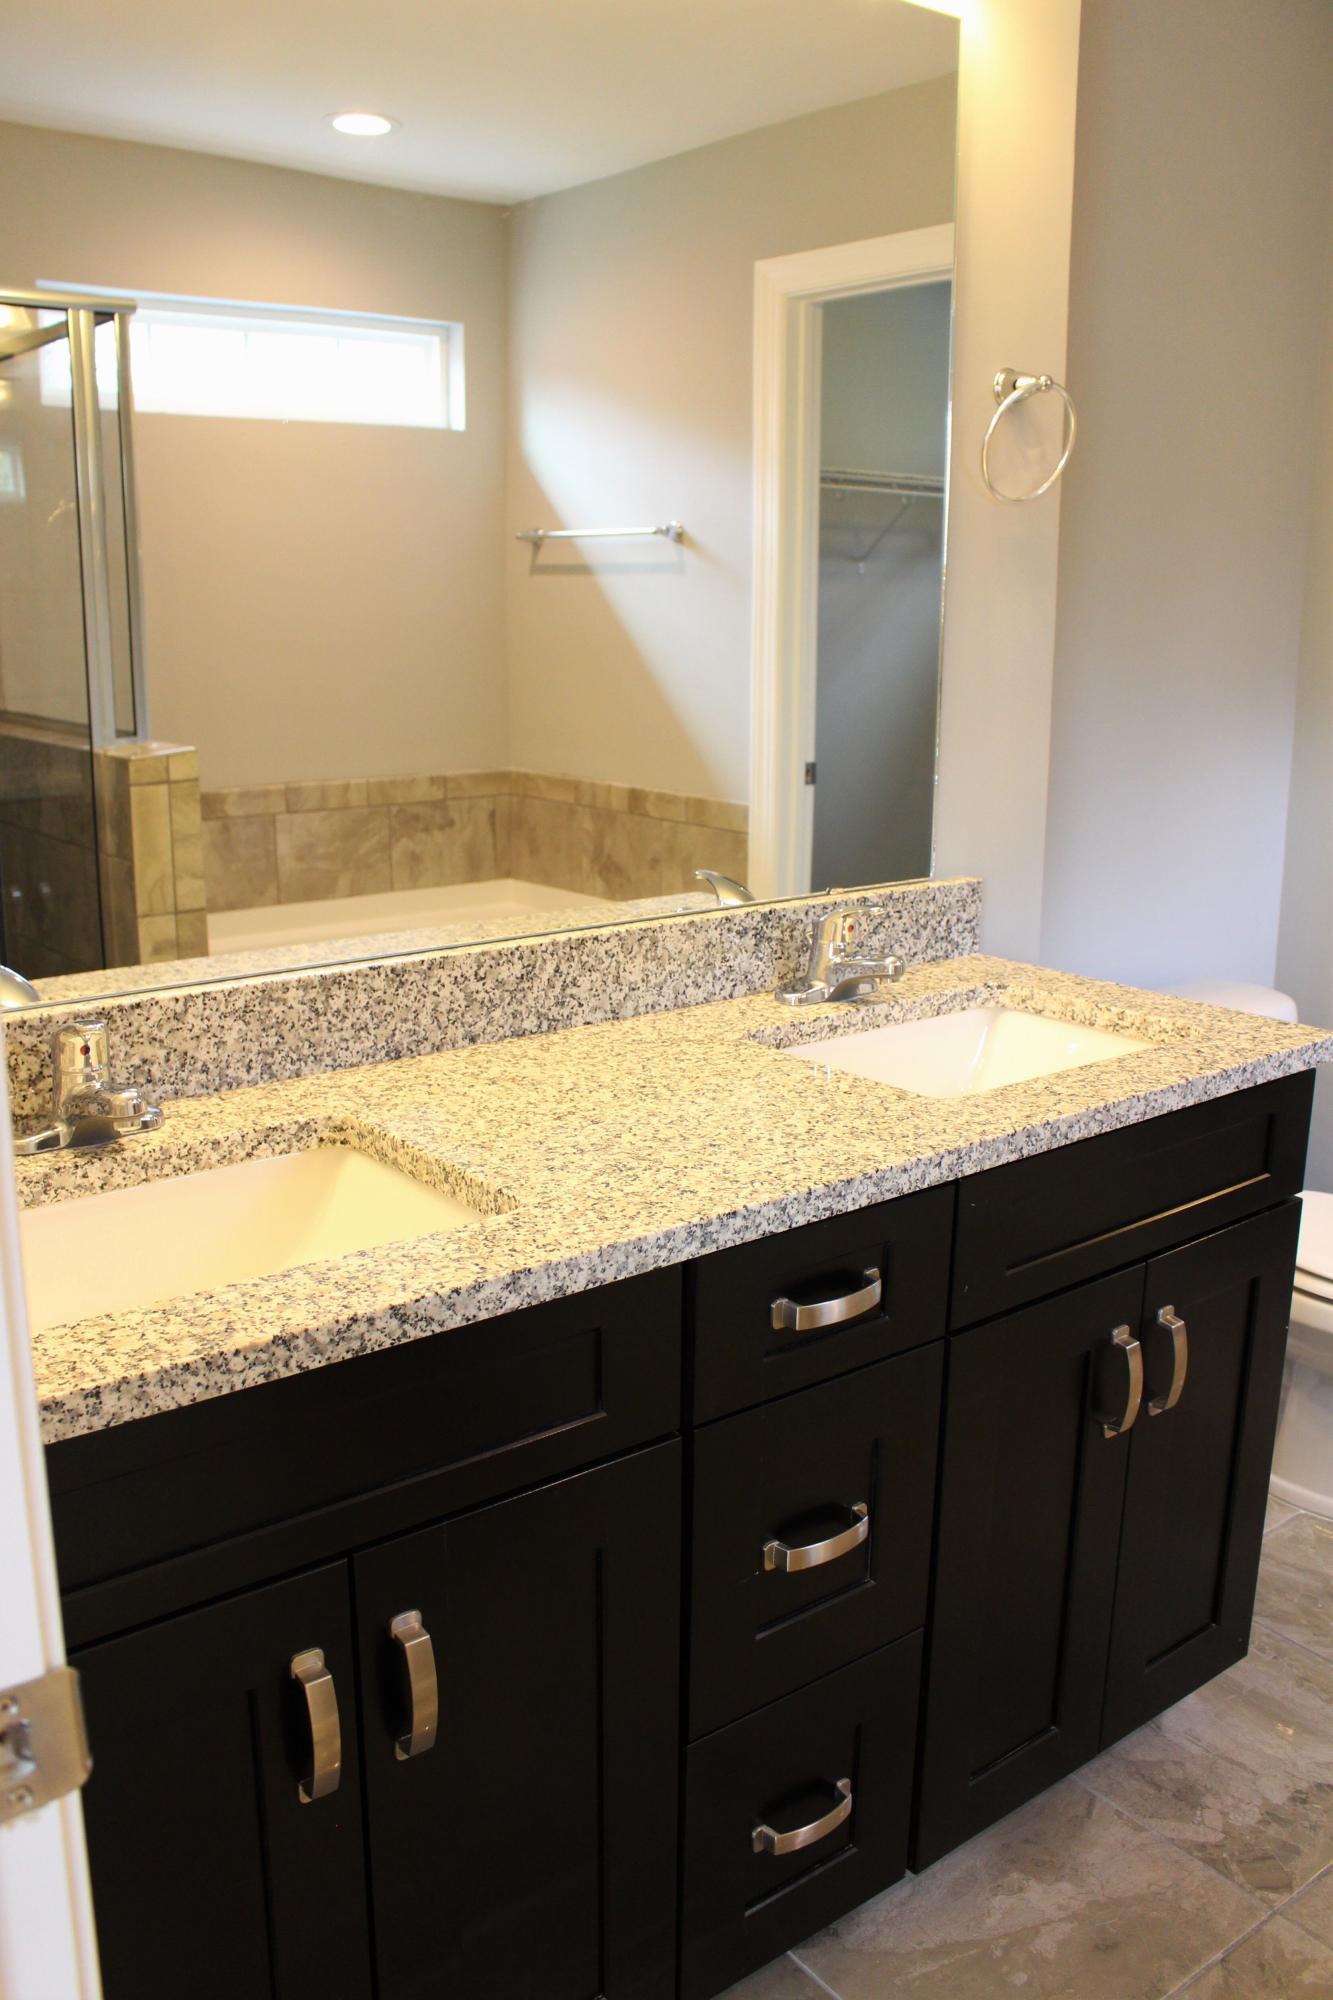 Filbin Creek Homes For Sale - 1173 Sumner, North Charleston, SC - 4